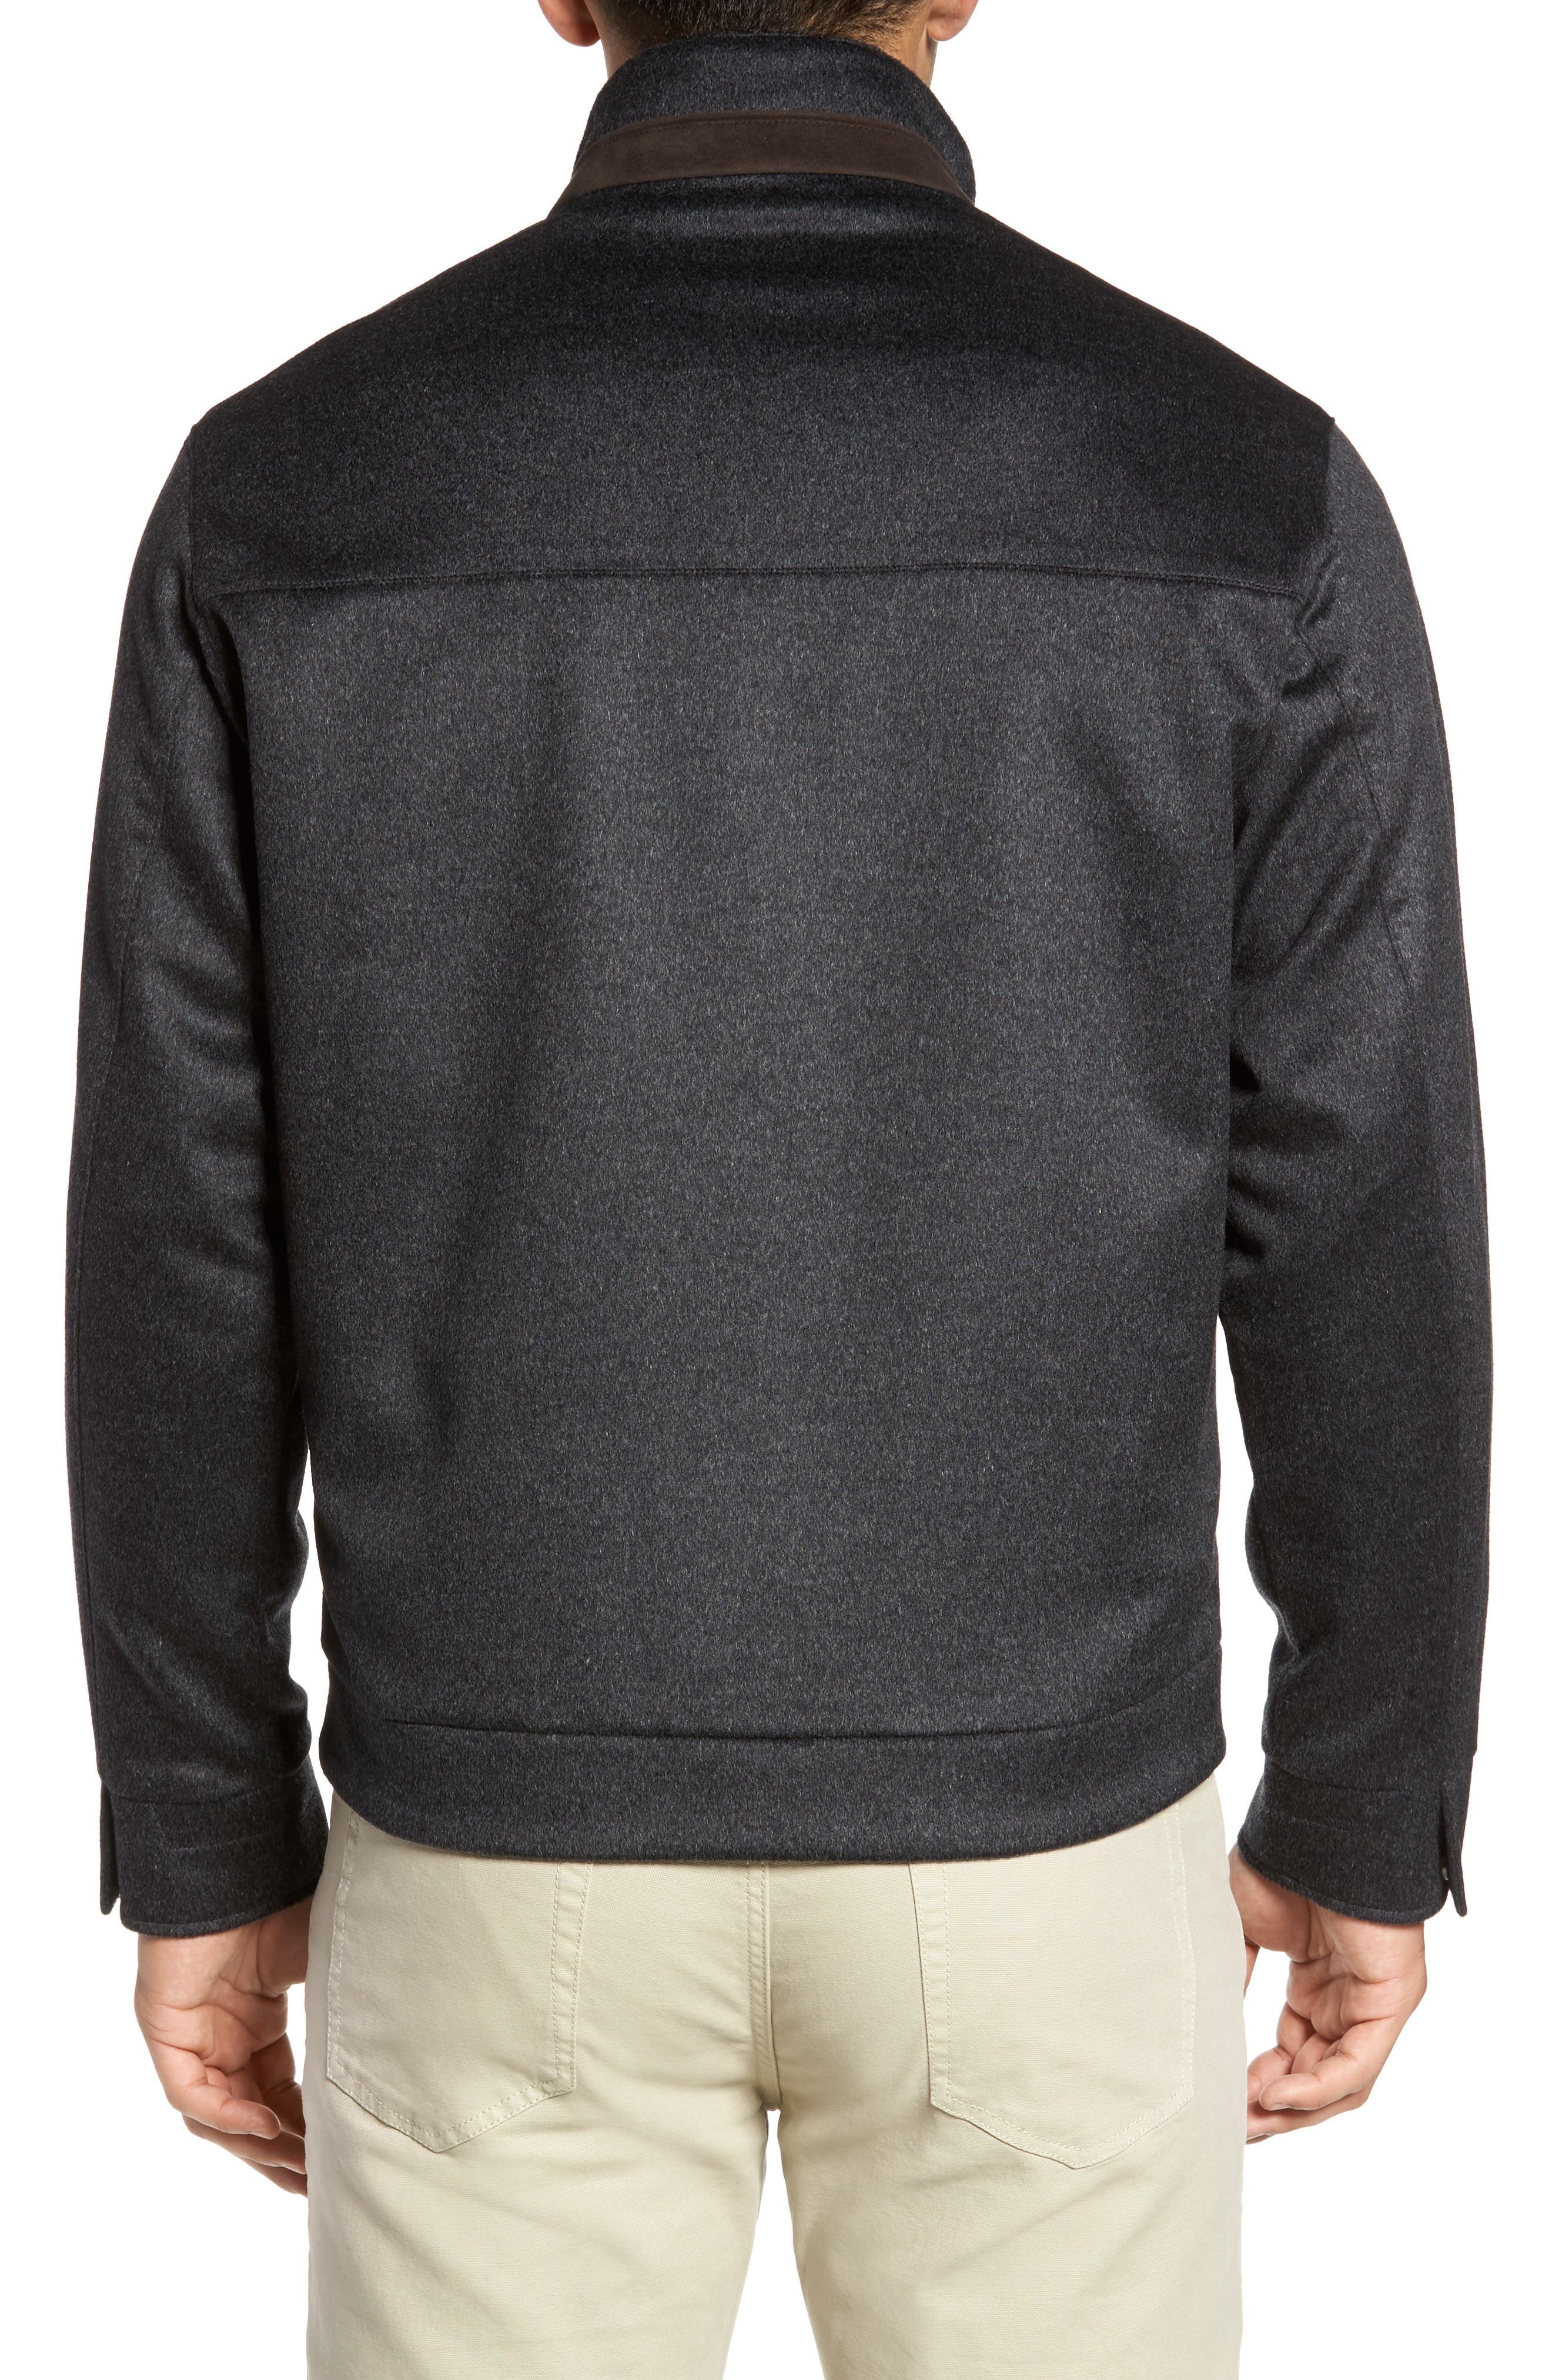 Westport Wool & Cashmere Jacket,                             Alternate thumbnail 5, color,